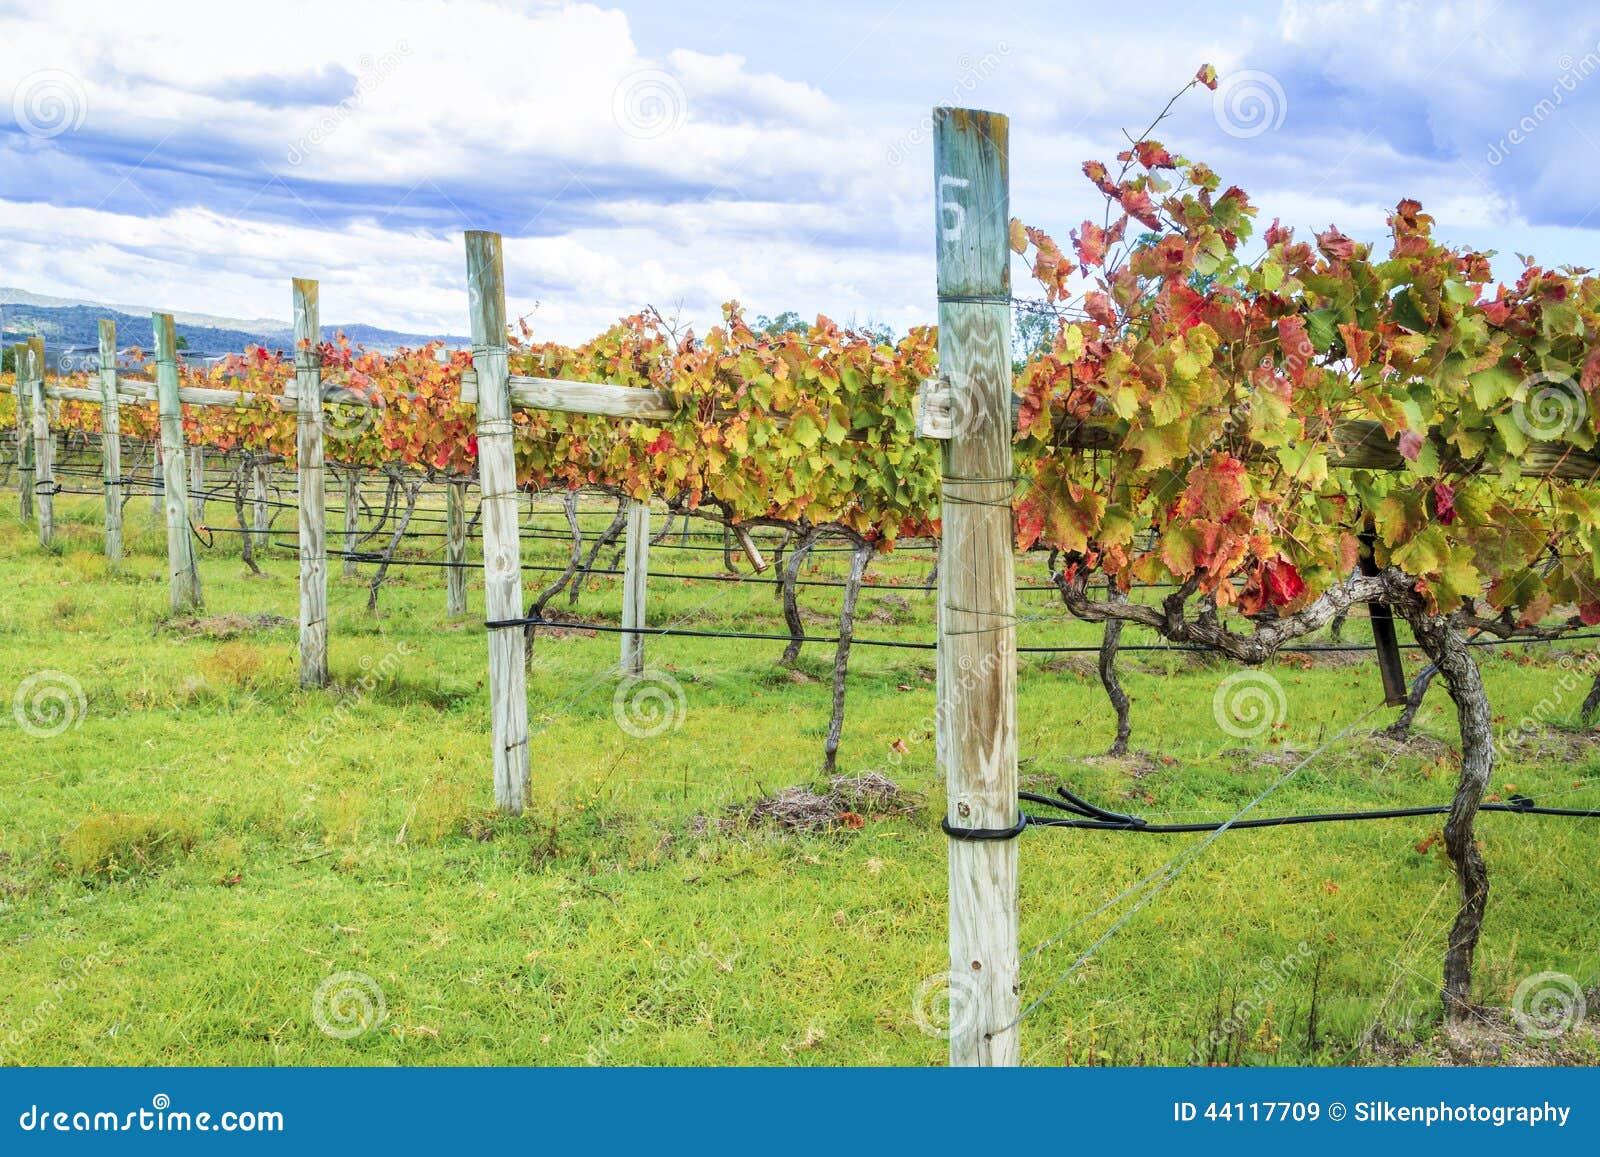 row of wine grape vines in autumn stock image